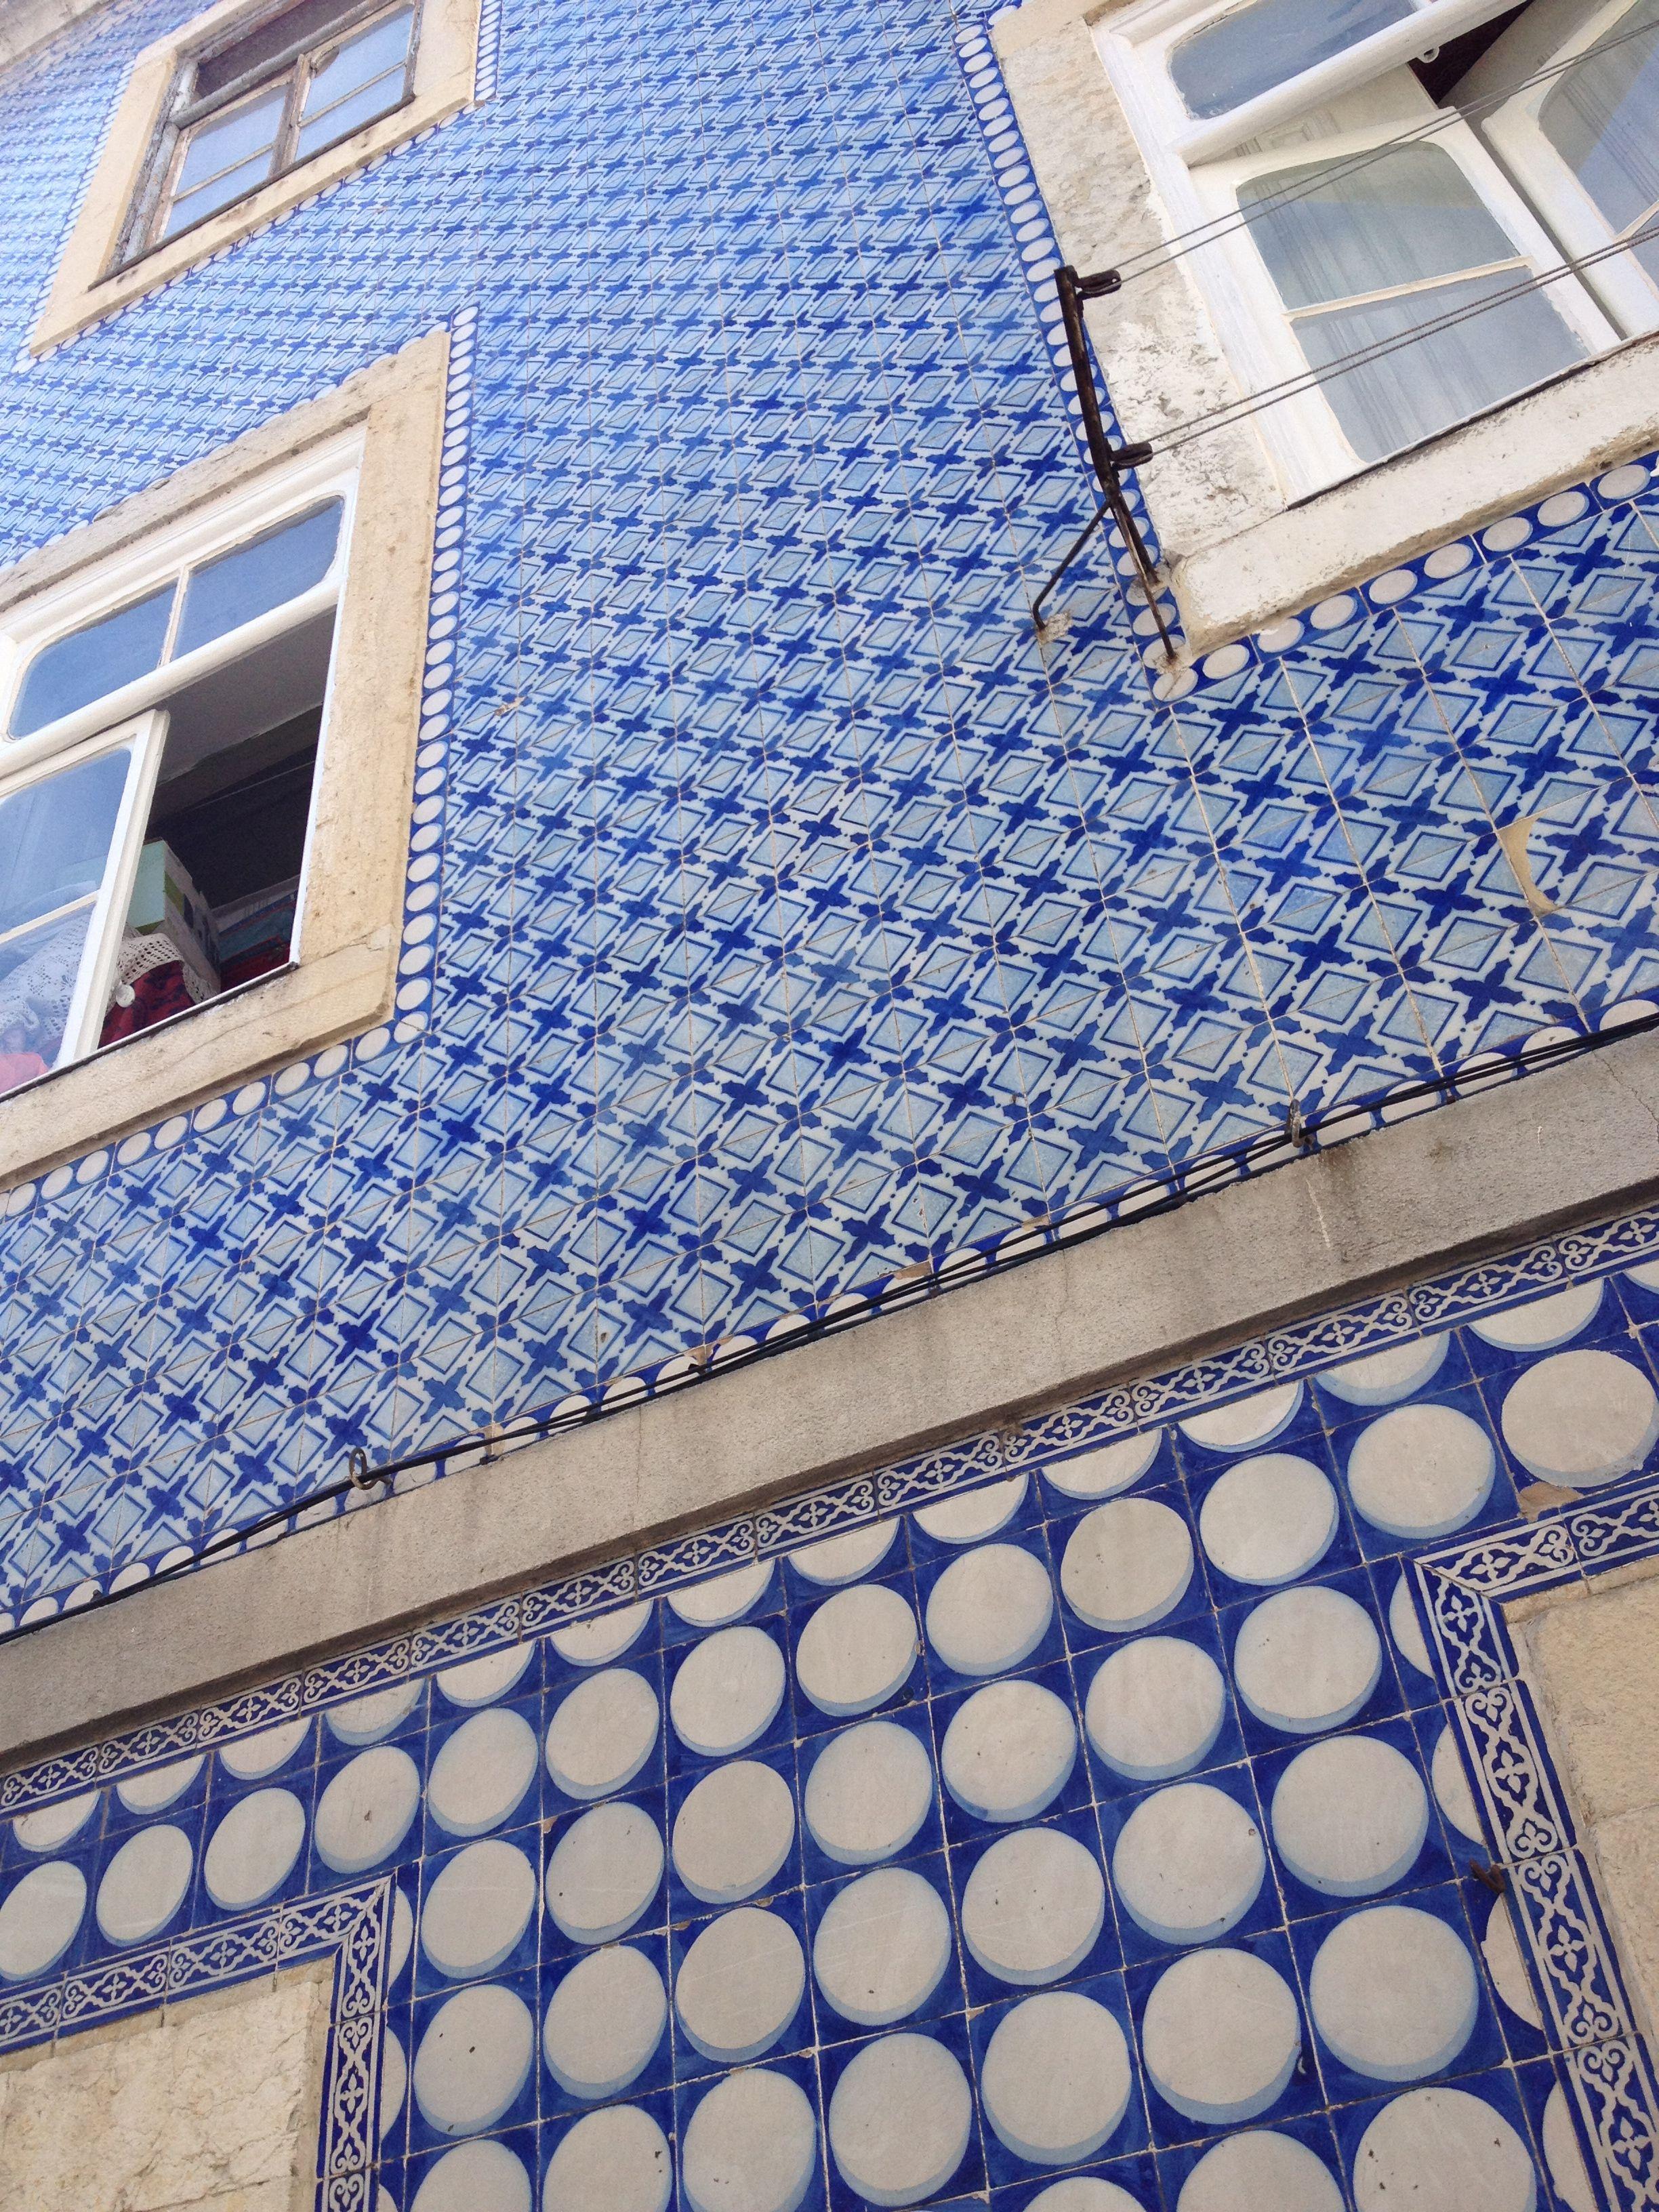 Beautiful Old Building Covered With Blue White Tiles Lisbonlocals Lisbon Portugal Tw Lisbonlocals Com Portuguese Tiles Handcrafted Tile Blue Tiles